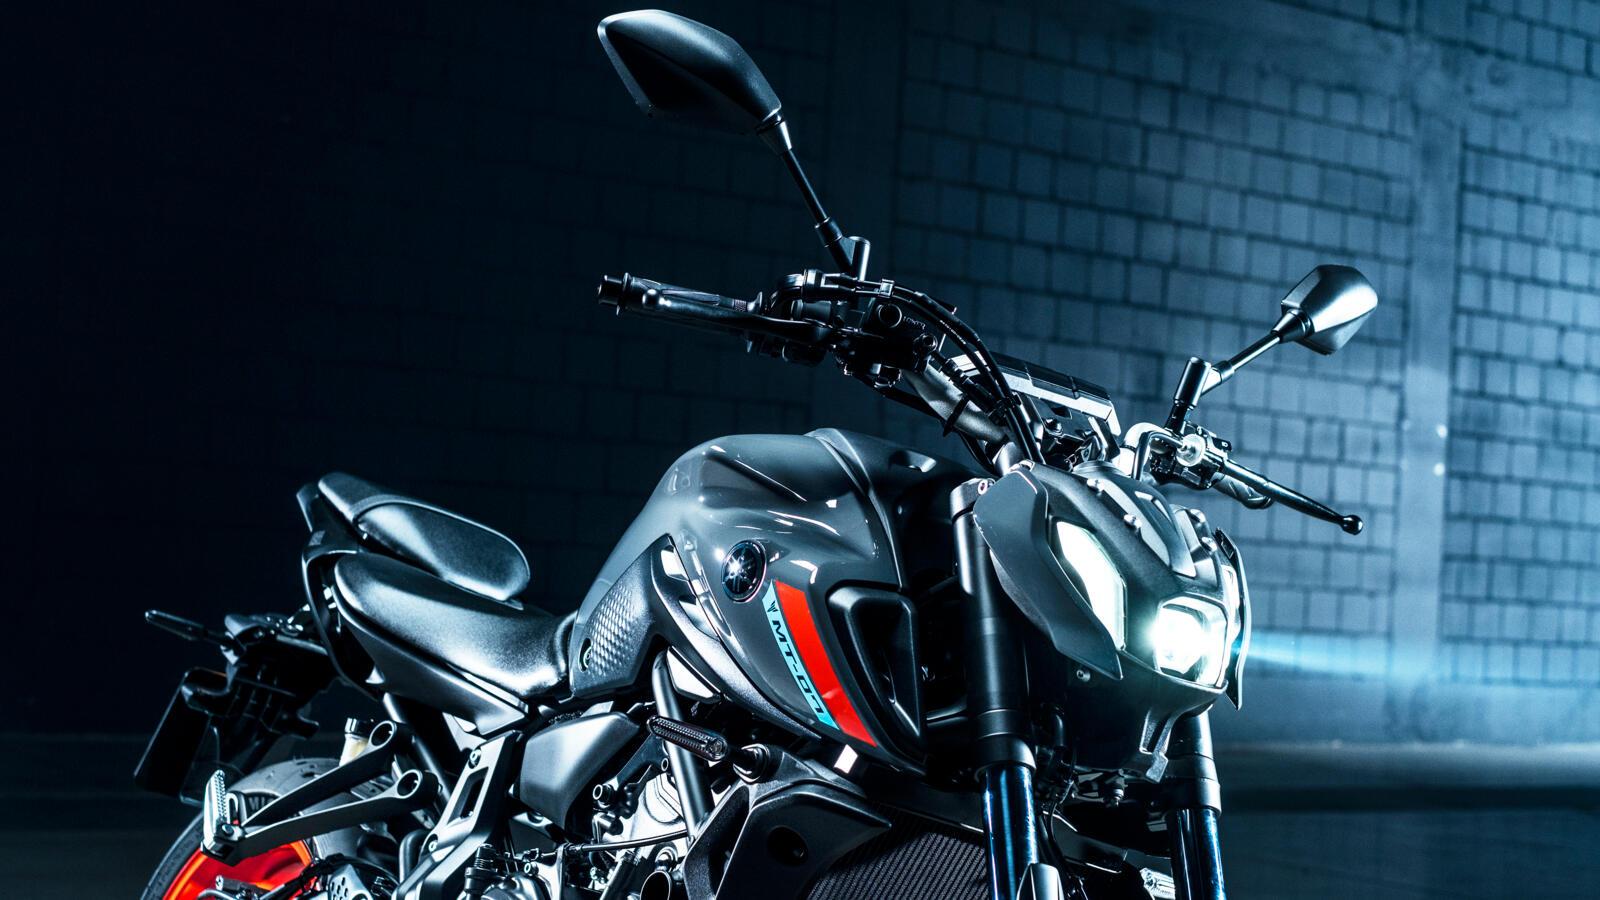 Yamaha-MT-07-my2021-16